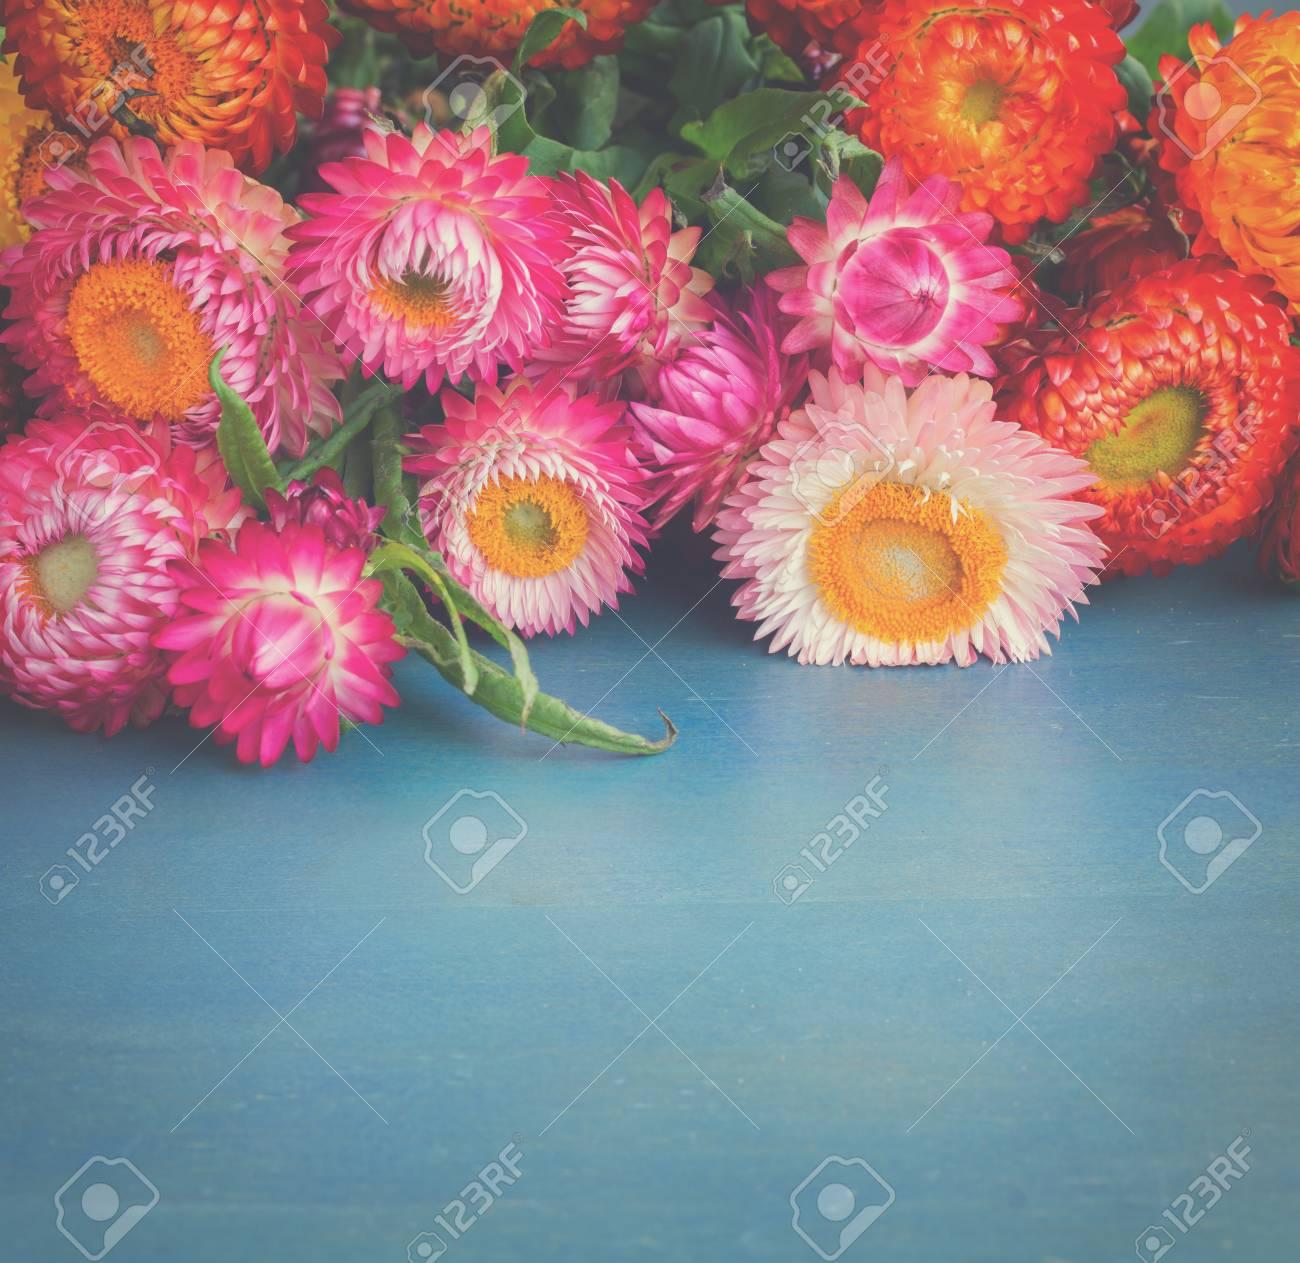 Bouquet of everlasting flowers bouquet on blue table with copy bouquet of everlasting flowers bouquet on blue table with copy space retro toned stock photo izmirmasajfo